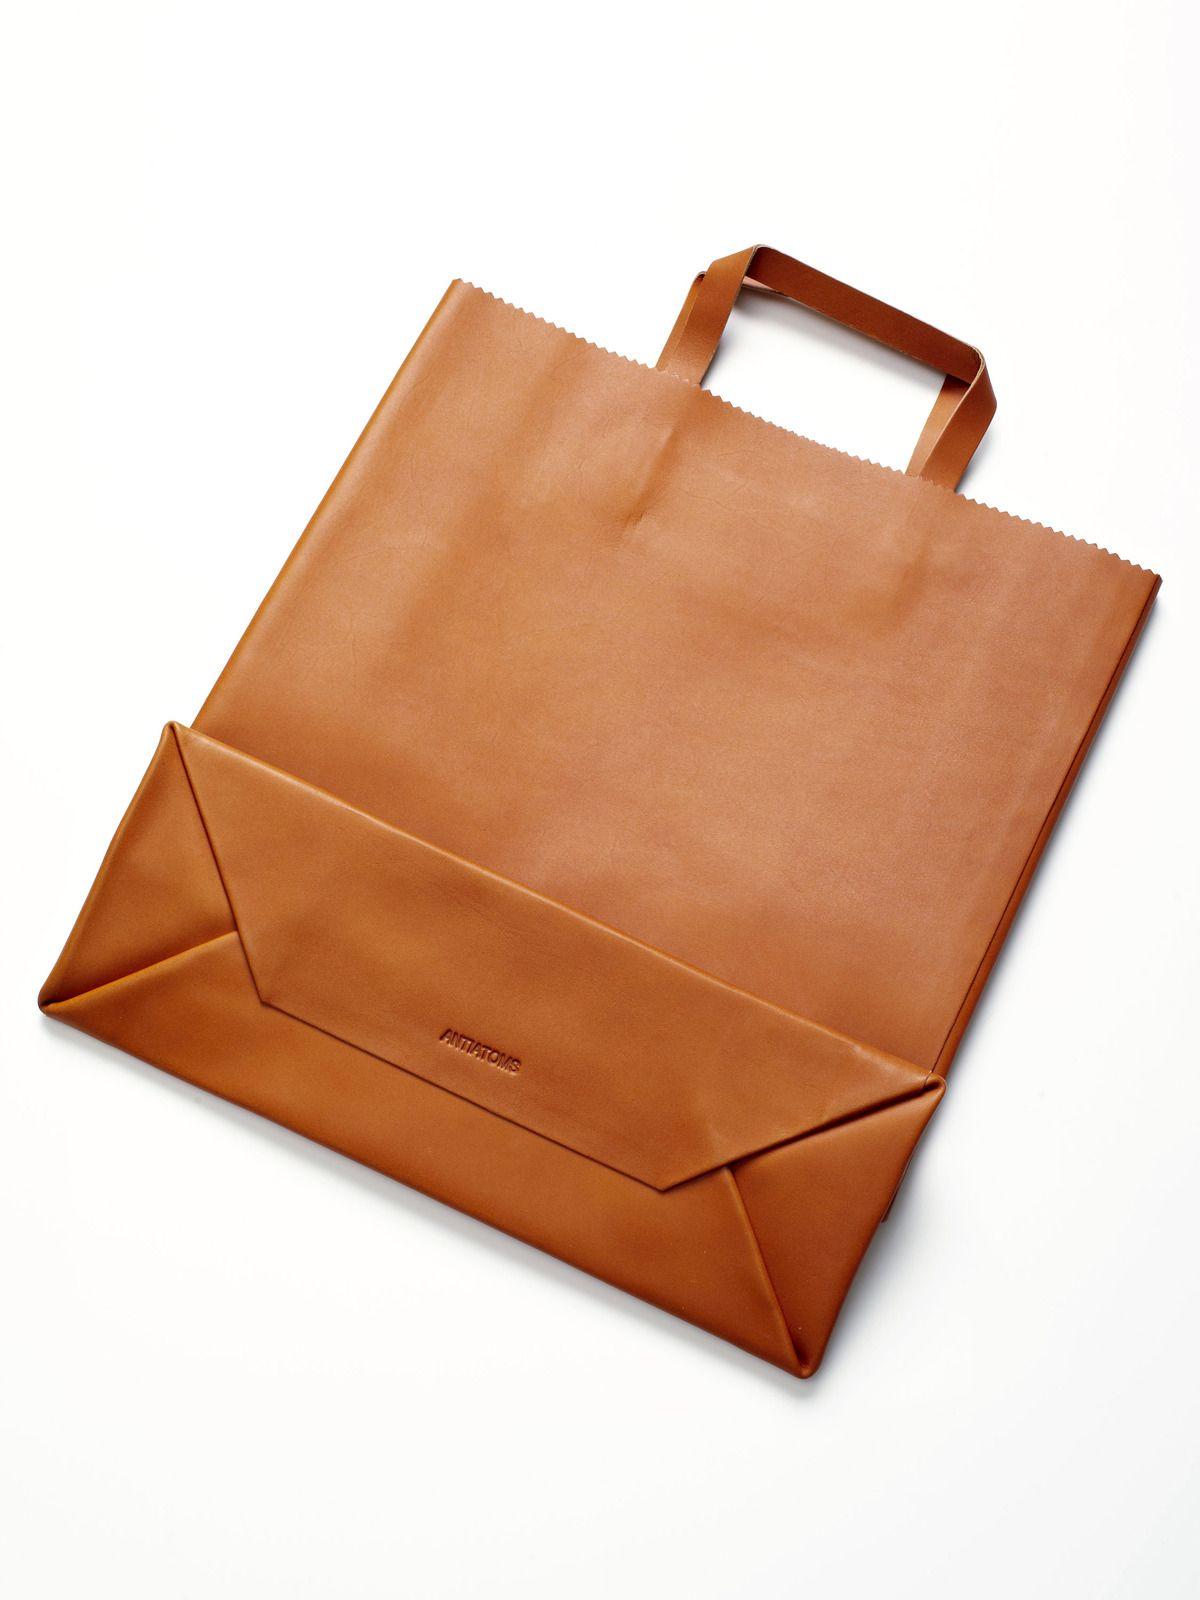 80c9457d0273 Antiatoms Leather Shopping Bag